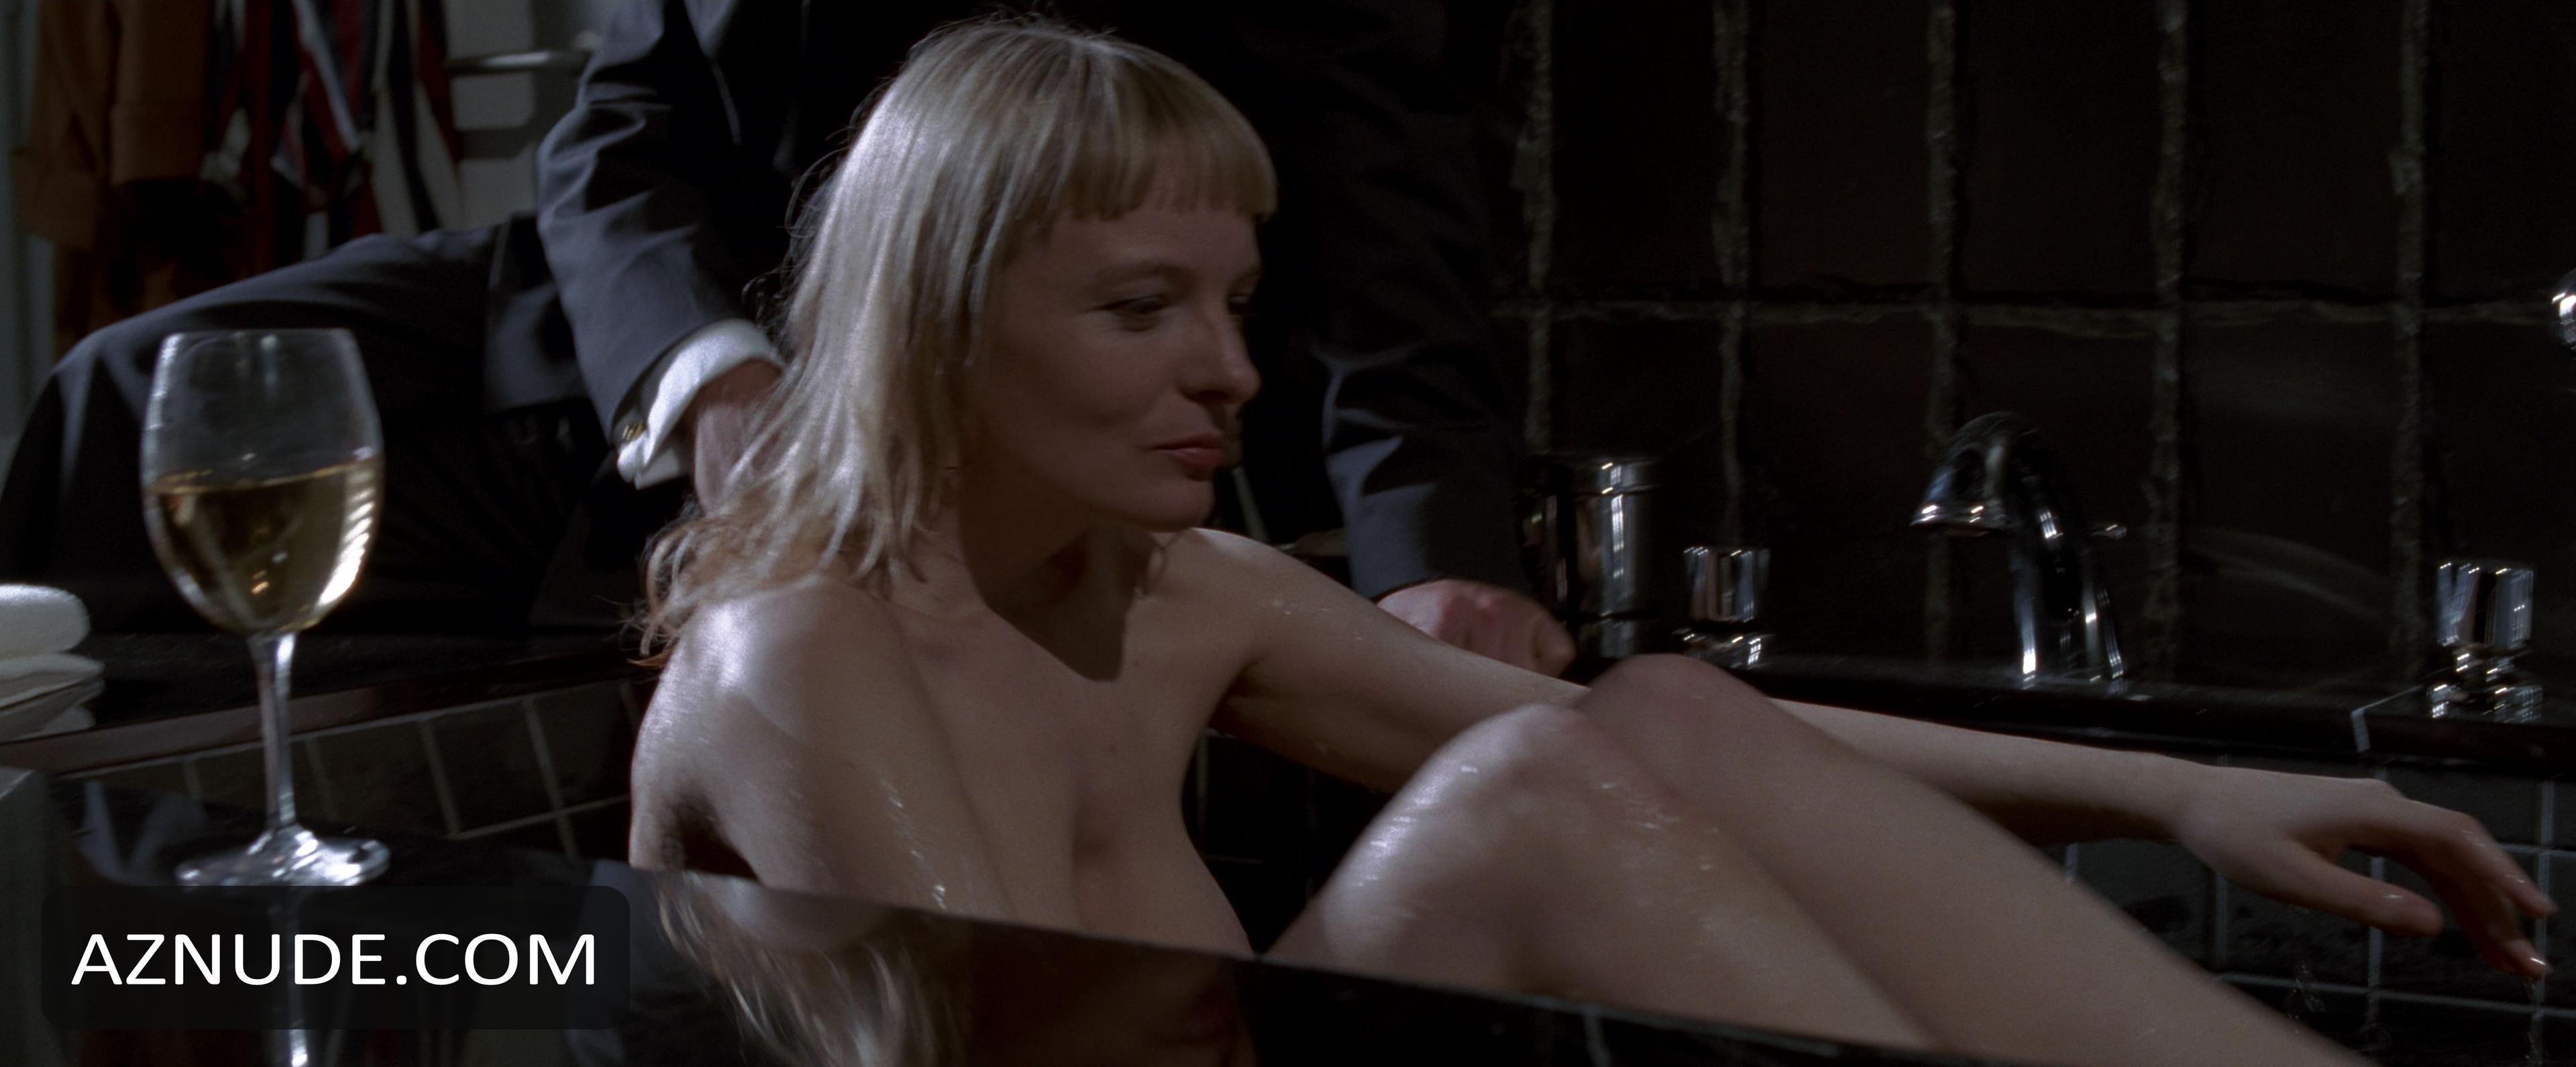 Naked sex dolls legs spread